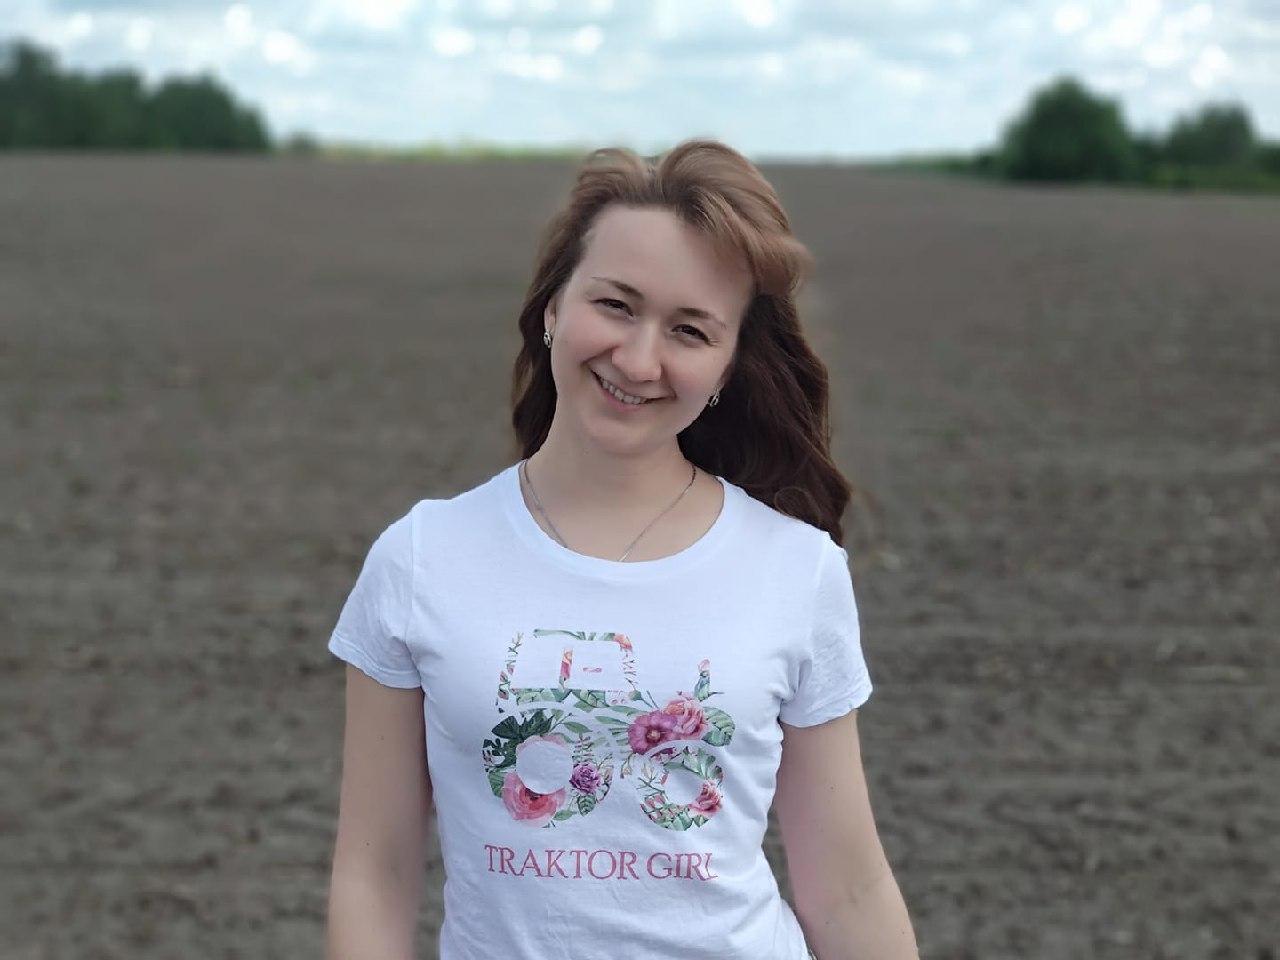 agadjanova_elena.jpg (88 KB)